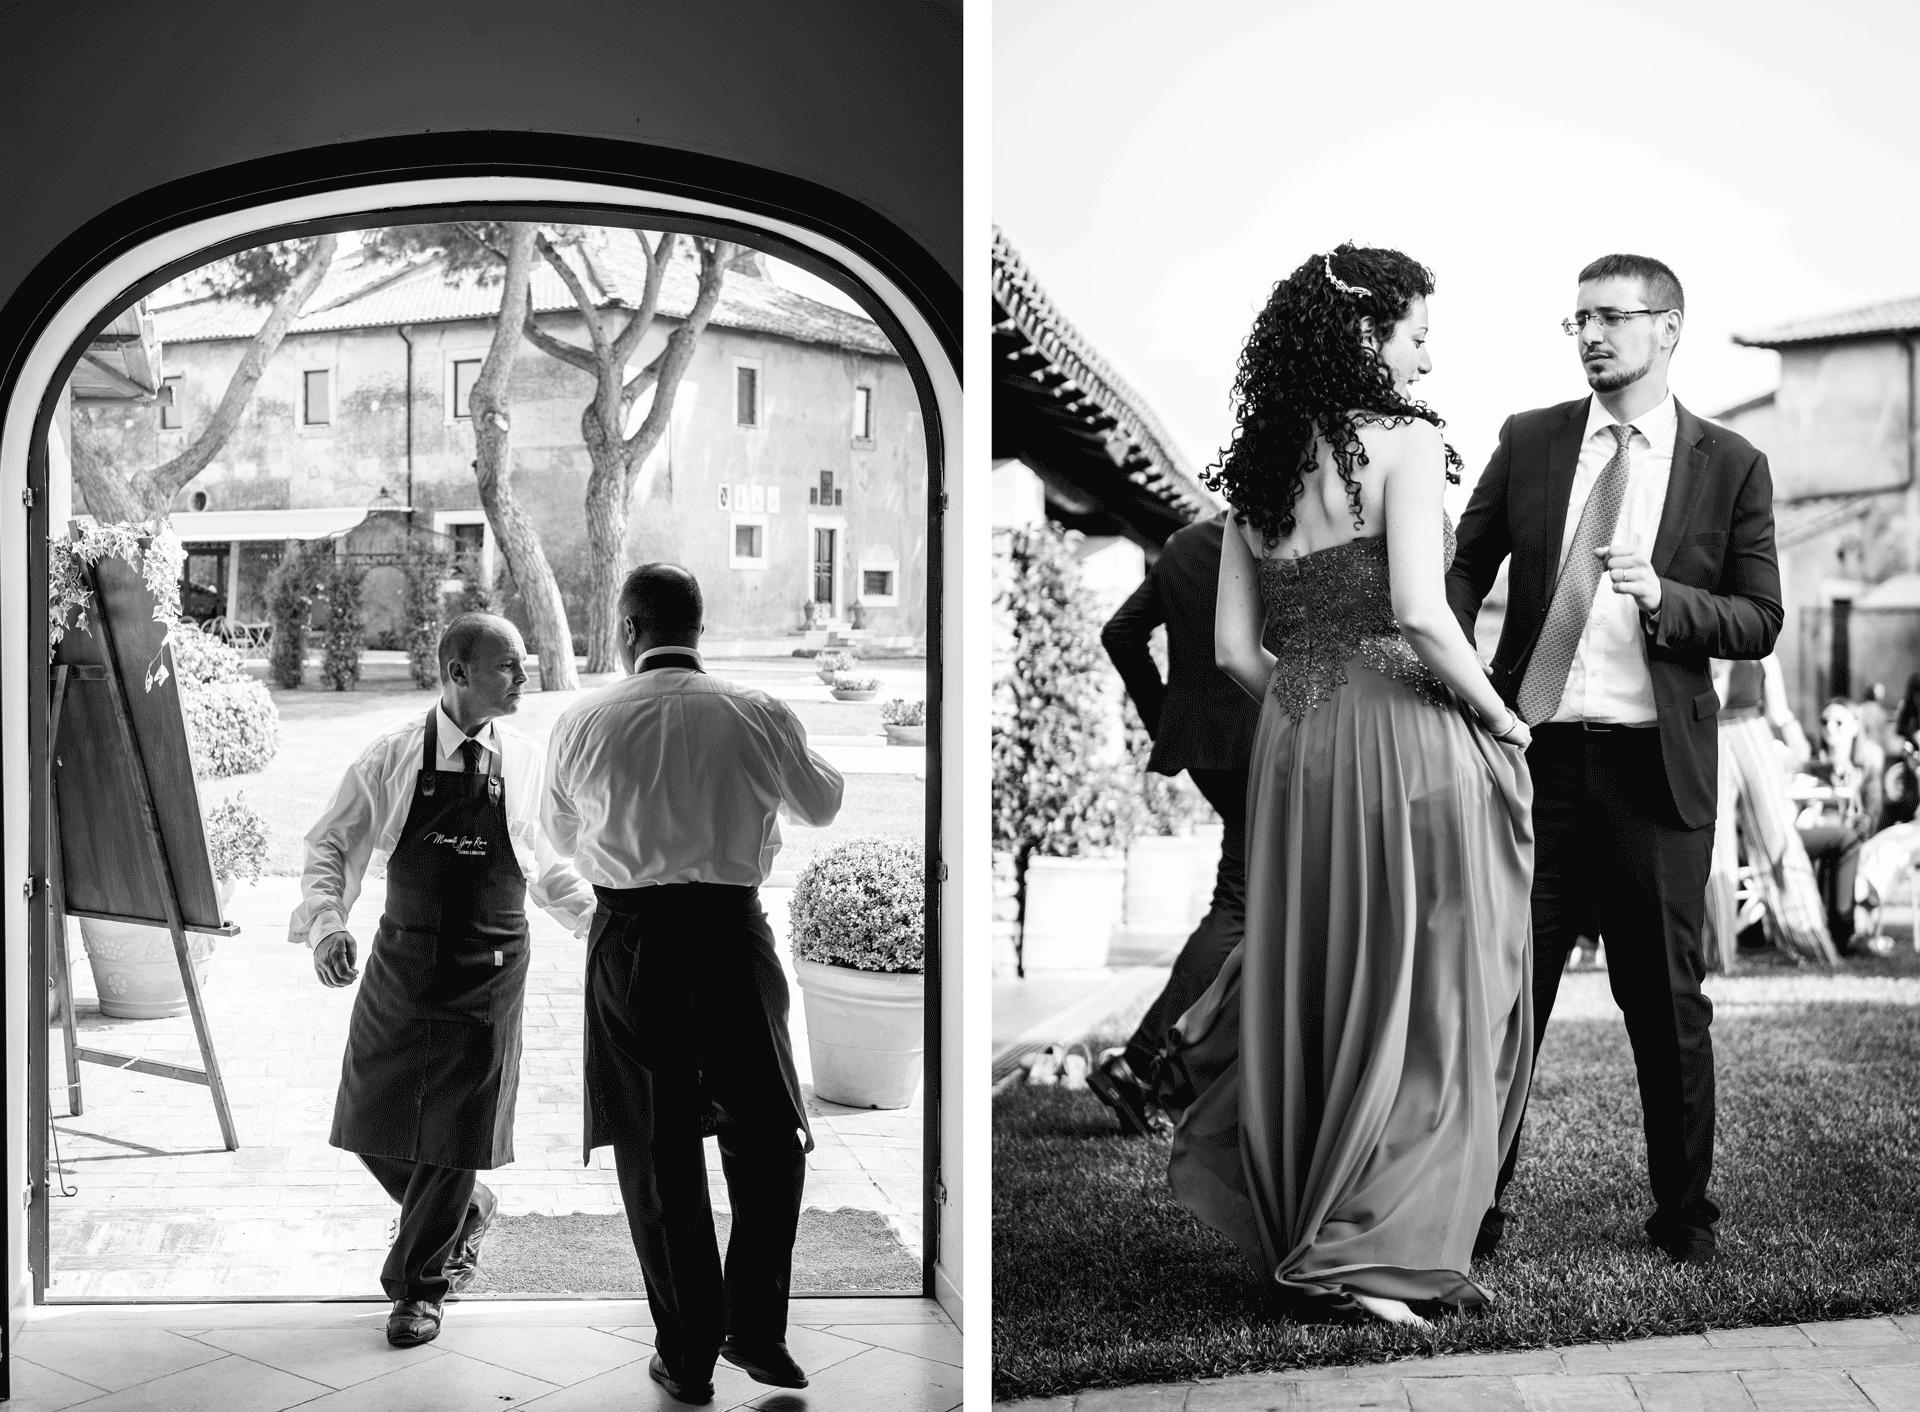 Fotografo-Matrimonio-Roma-Stile-Reportage-Ricevimento